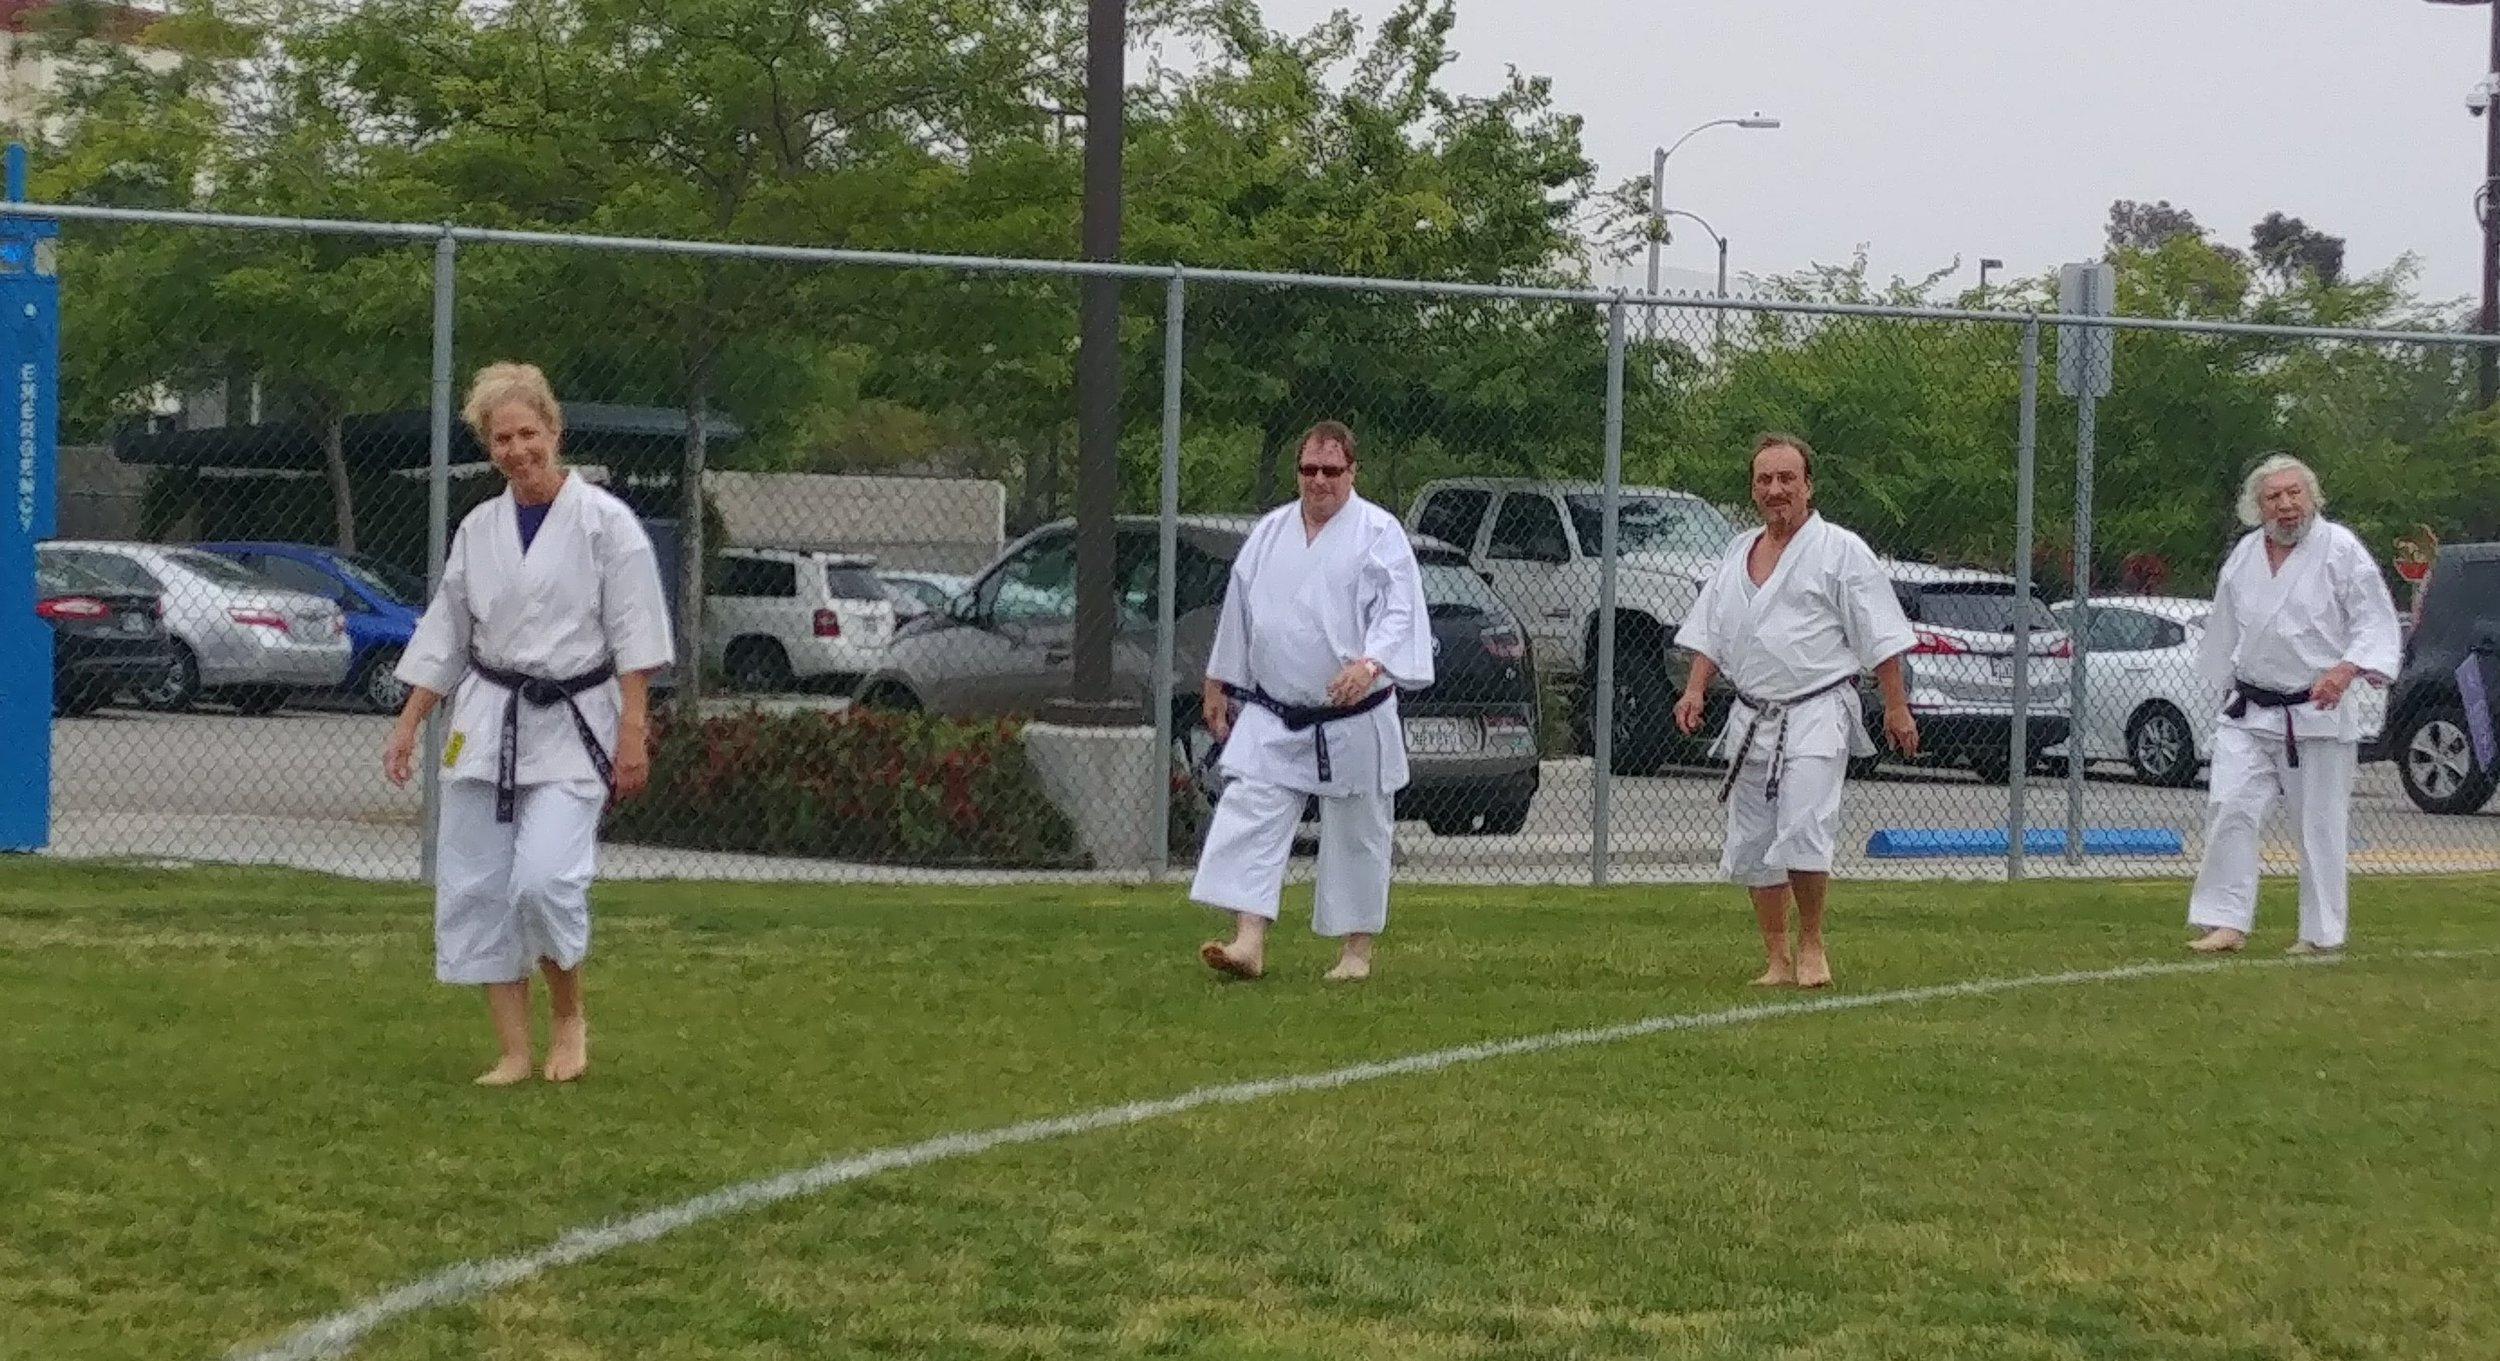 USKL Karate  Demo team %28walking the track%29 Relay for Life      ULV 5-19-18.jpg